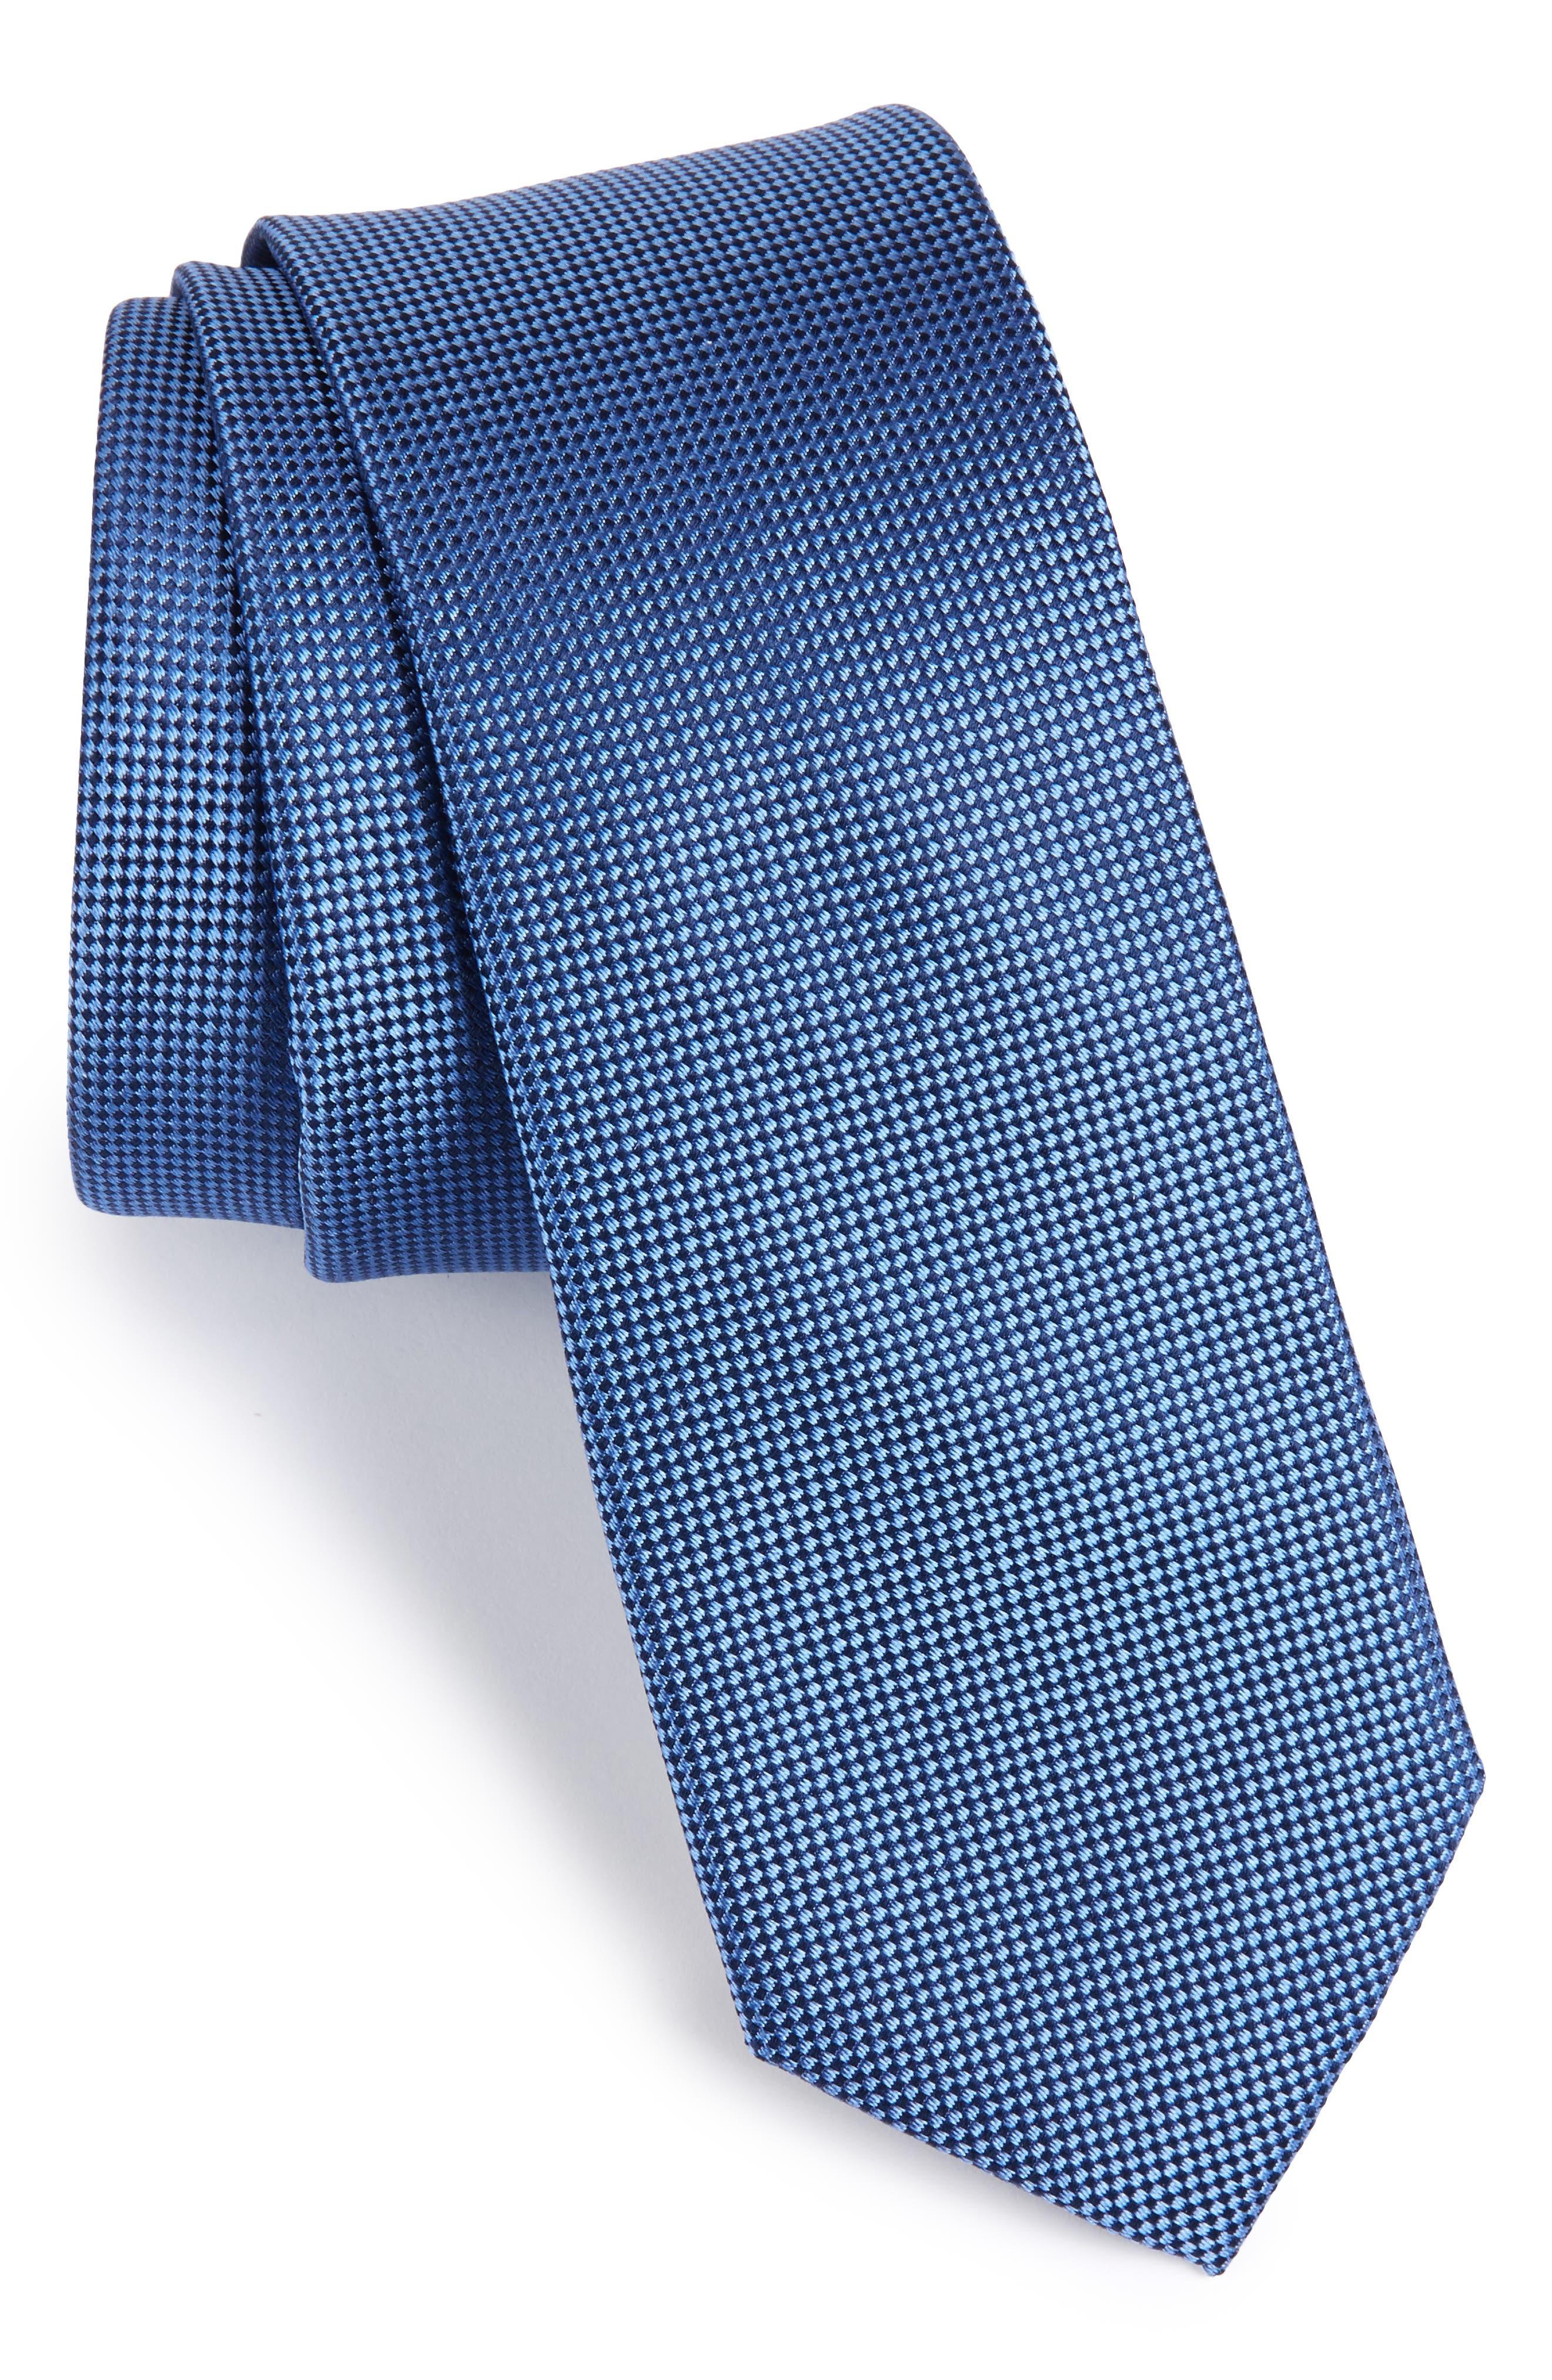 Nordstrom Men's Shop Oxford Solid Silk Skinny Tie